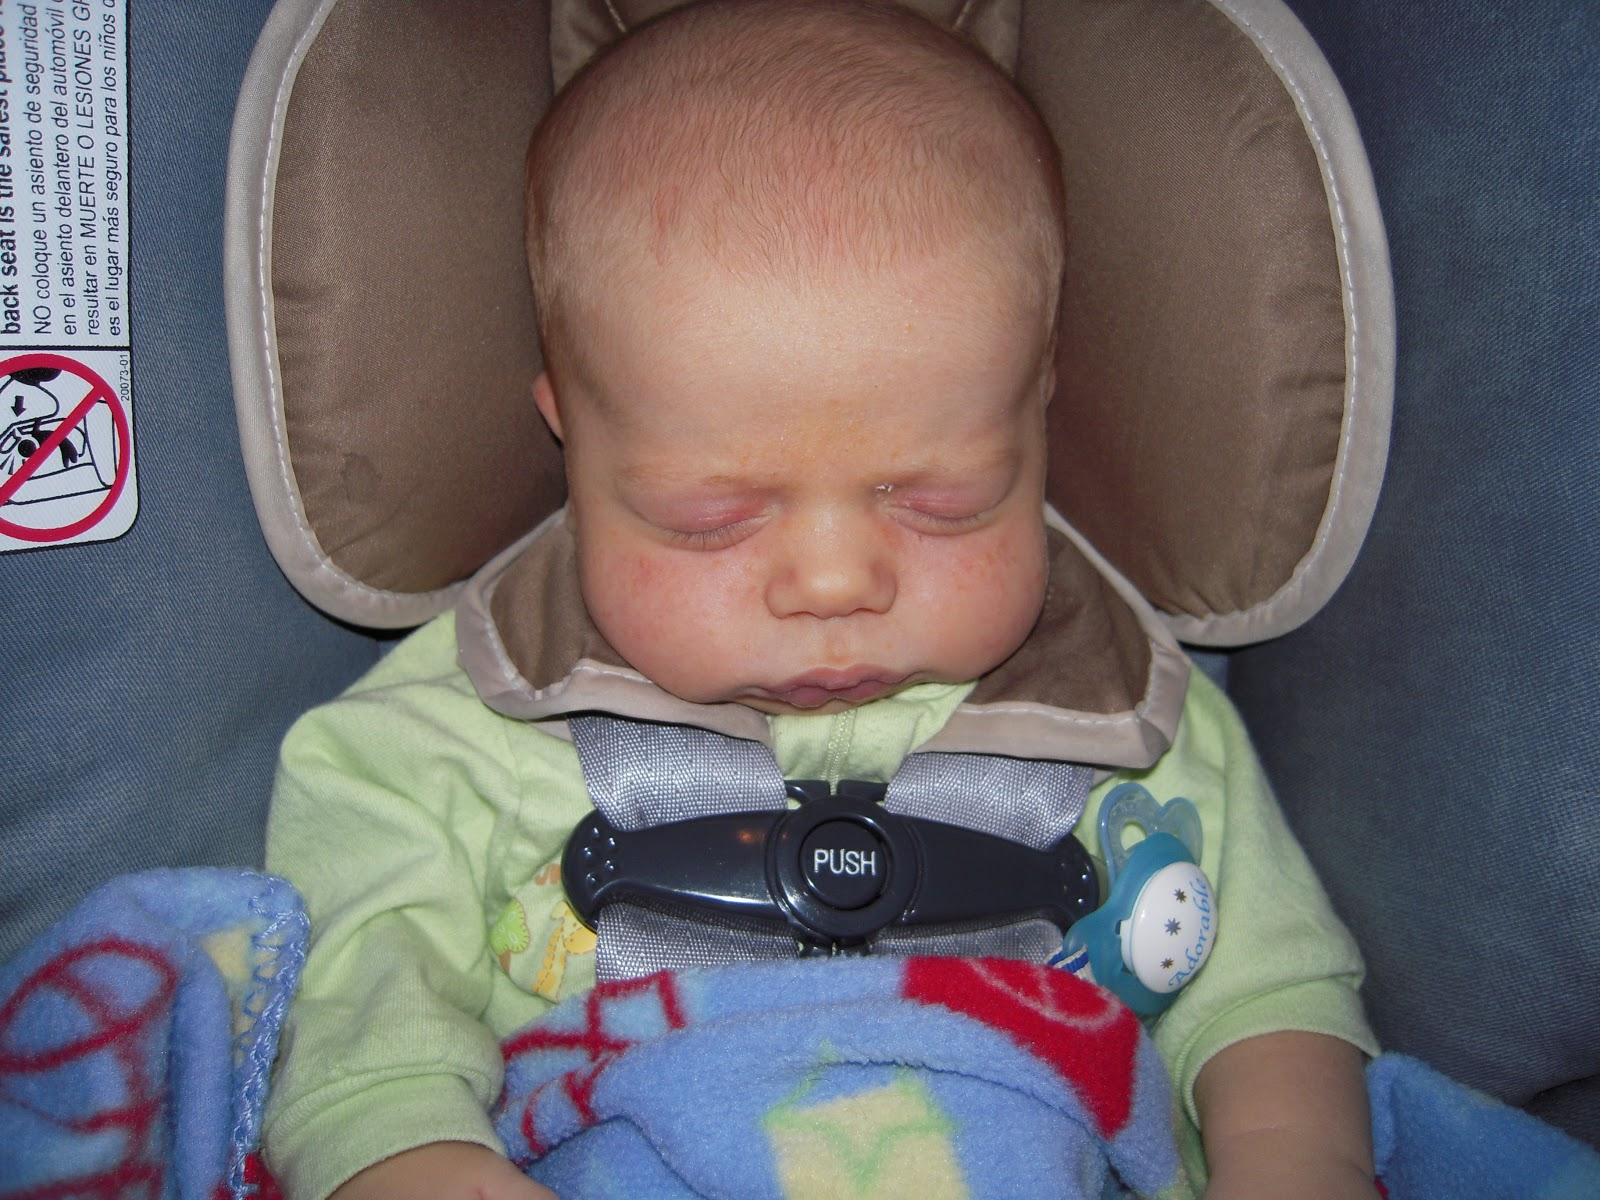 Jessica on Babies: Car Seat Rule #3: Newborns